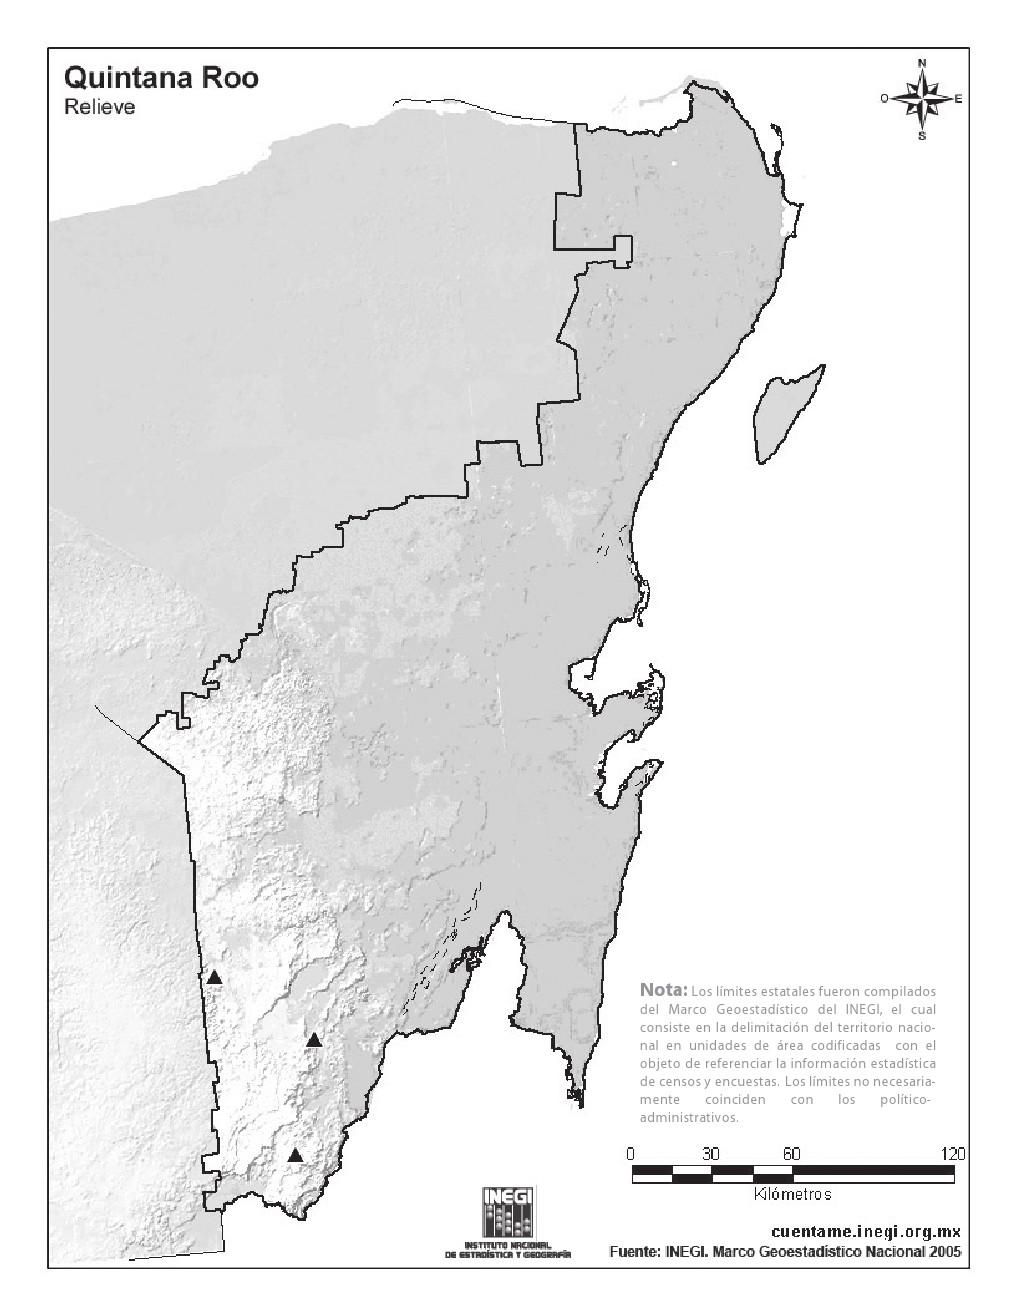 Mapa mudo de montañas de Quintana Roo. INEGI de México